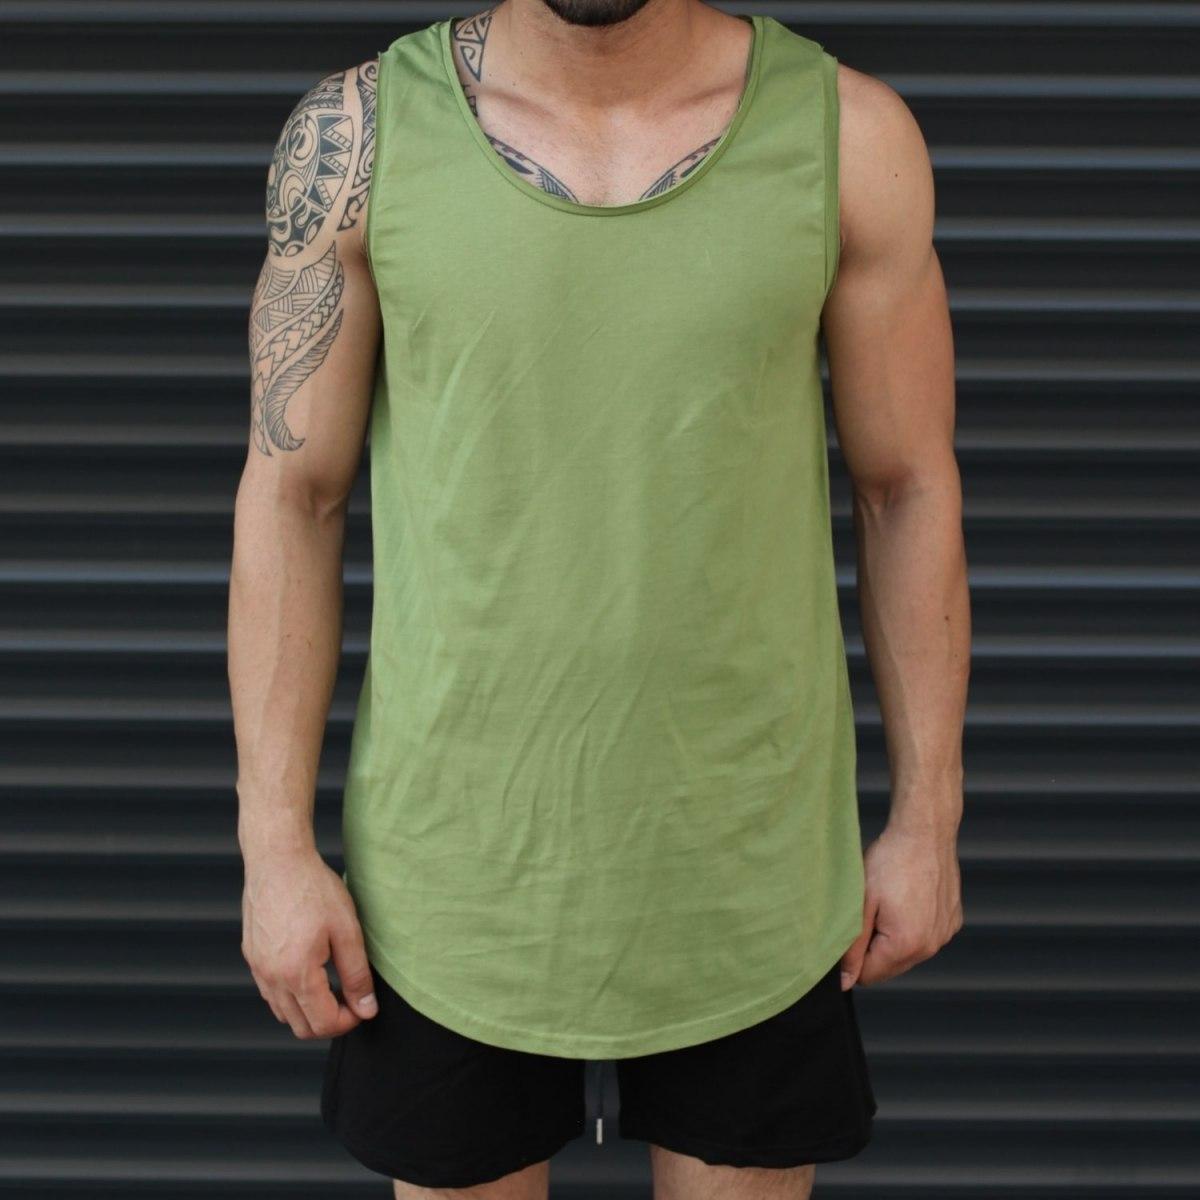 Men's Athletic Sleeveless Longline Tank Top Khaki